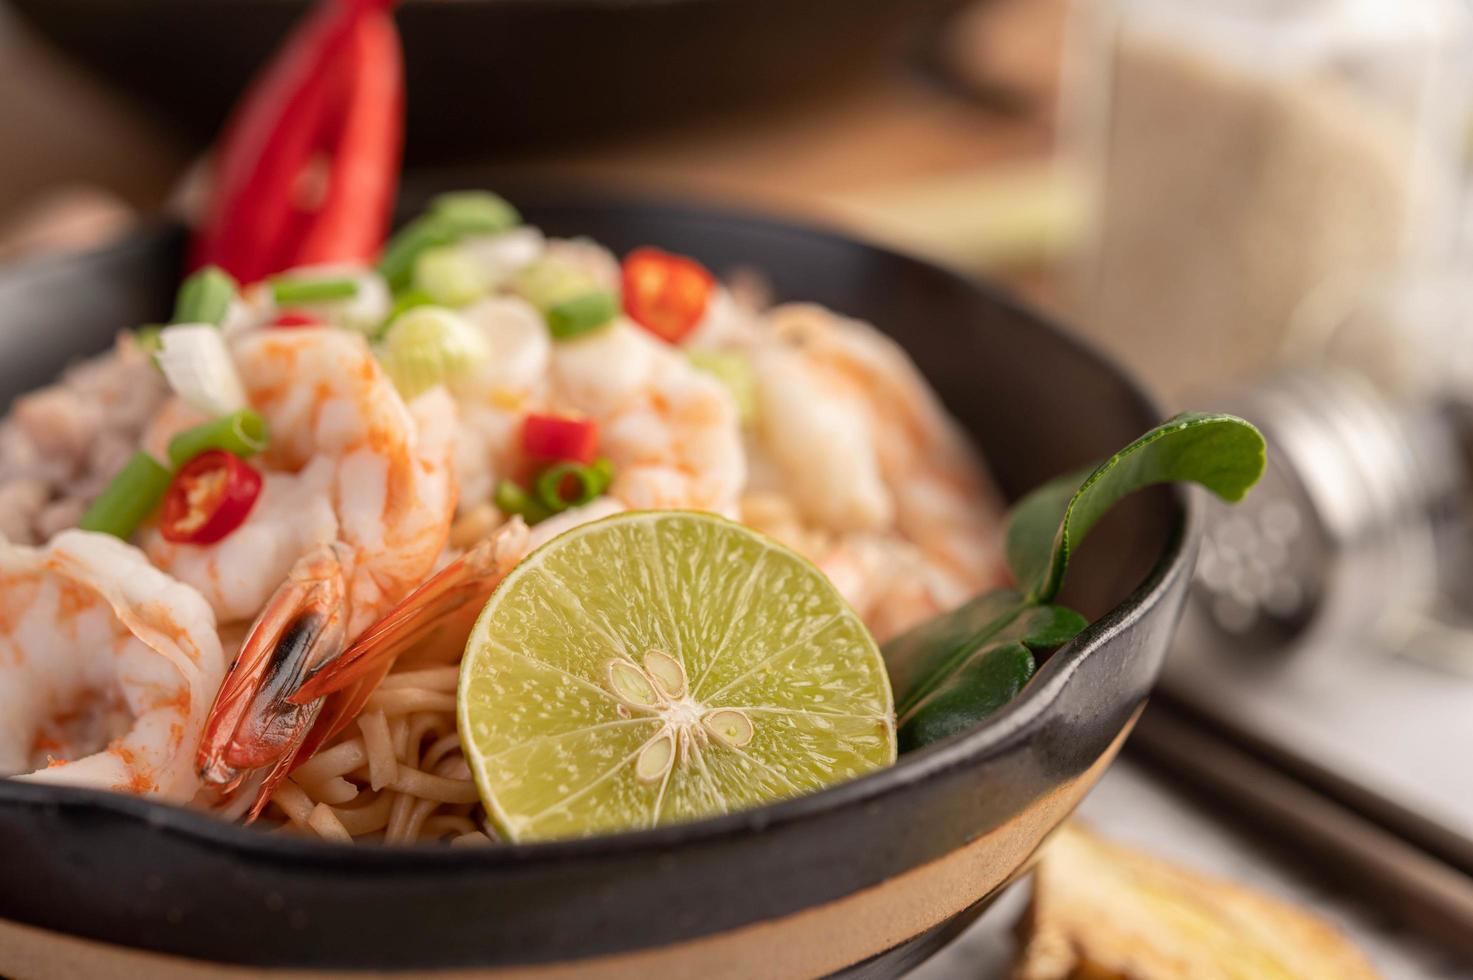 Instant noodles stir-fried with shrimp and pork photo